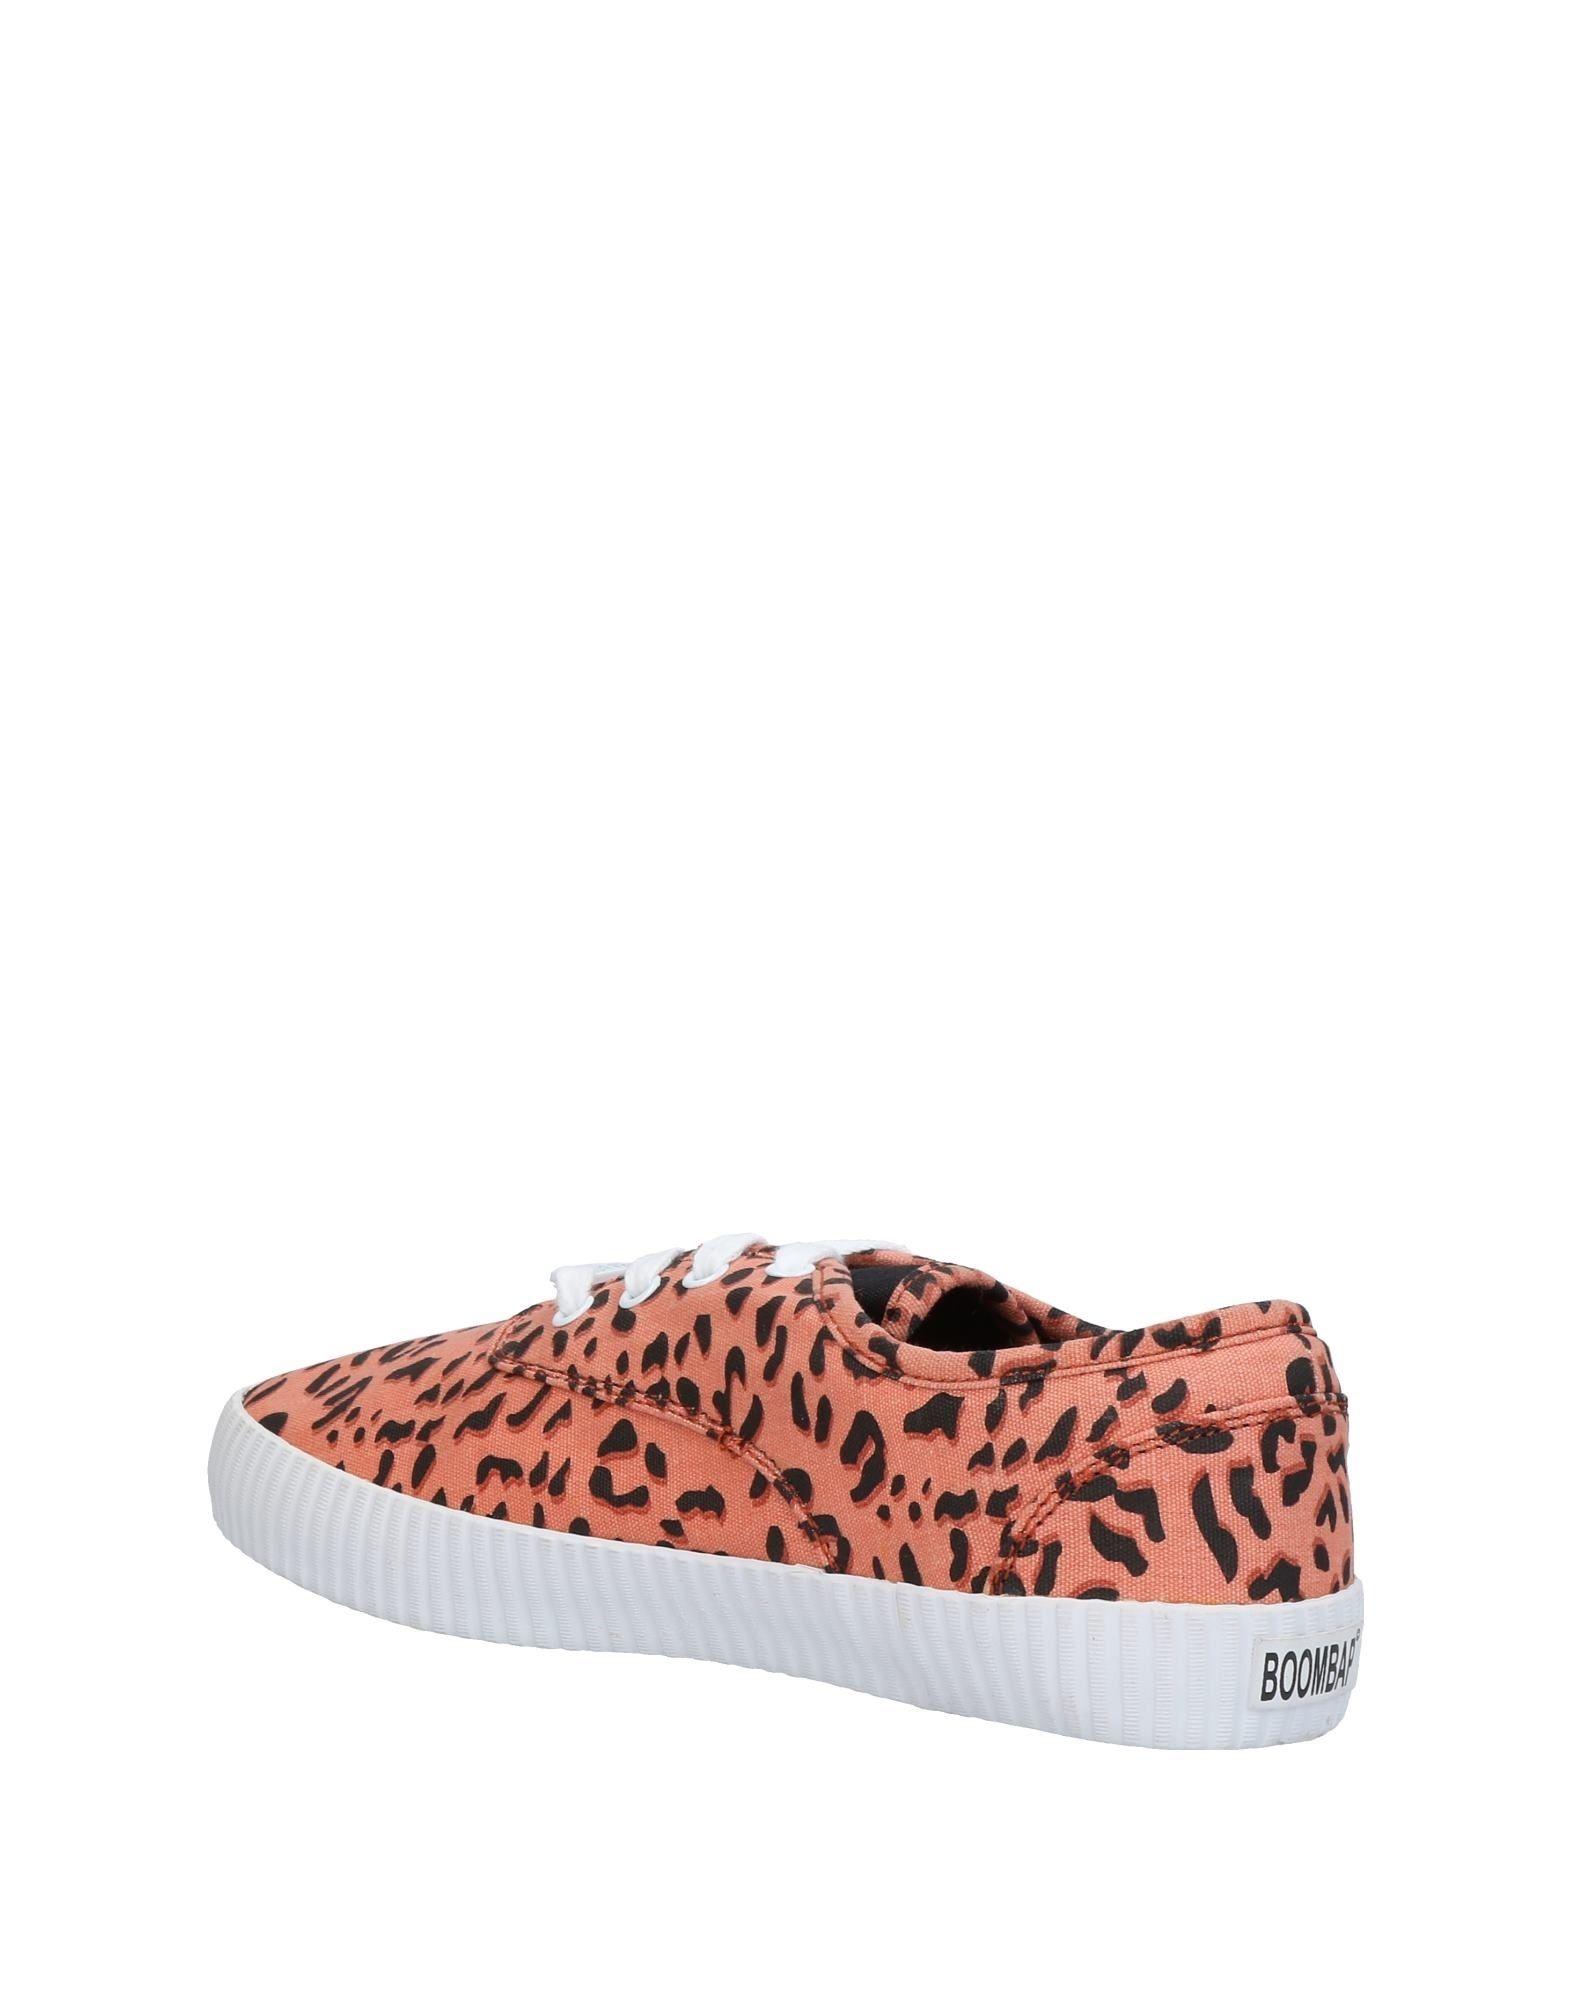 Sneakers Boombap Femme - Sneakers Boombap sur